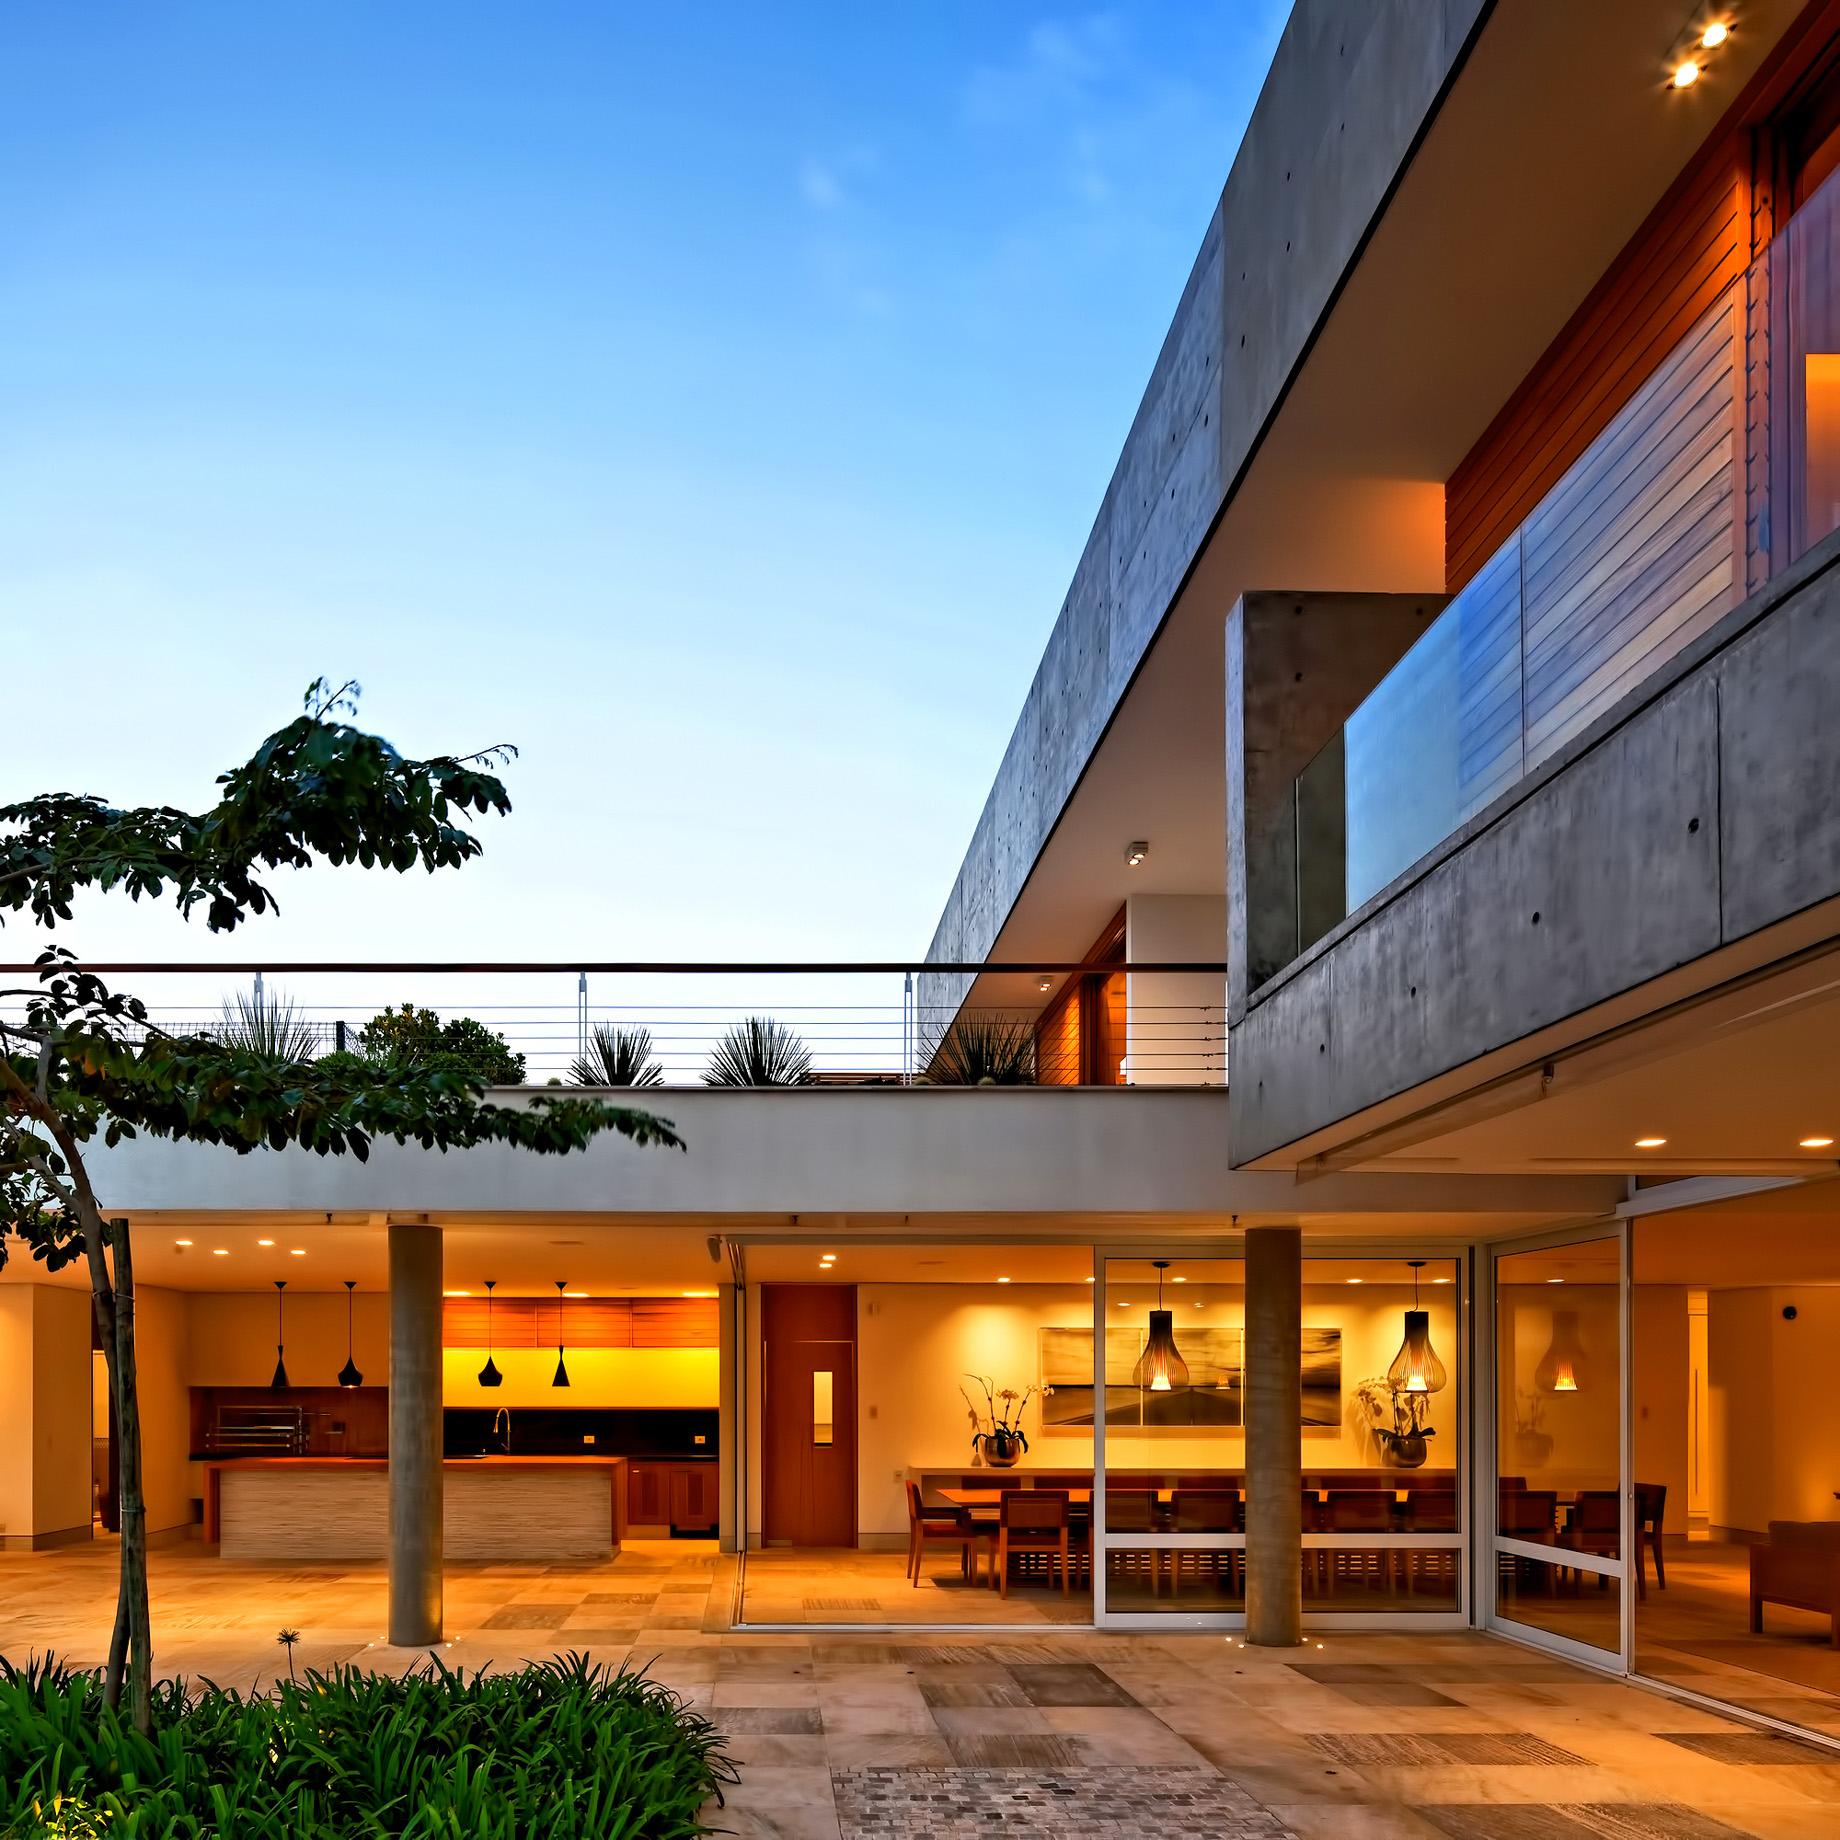 FG Residence - Araraquara, São Paulo, Brazil